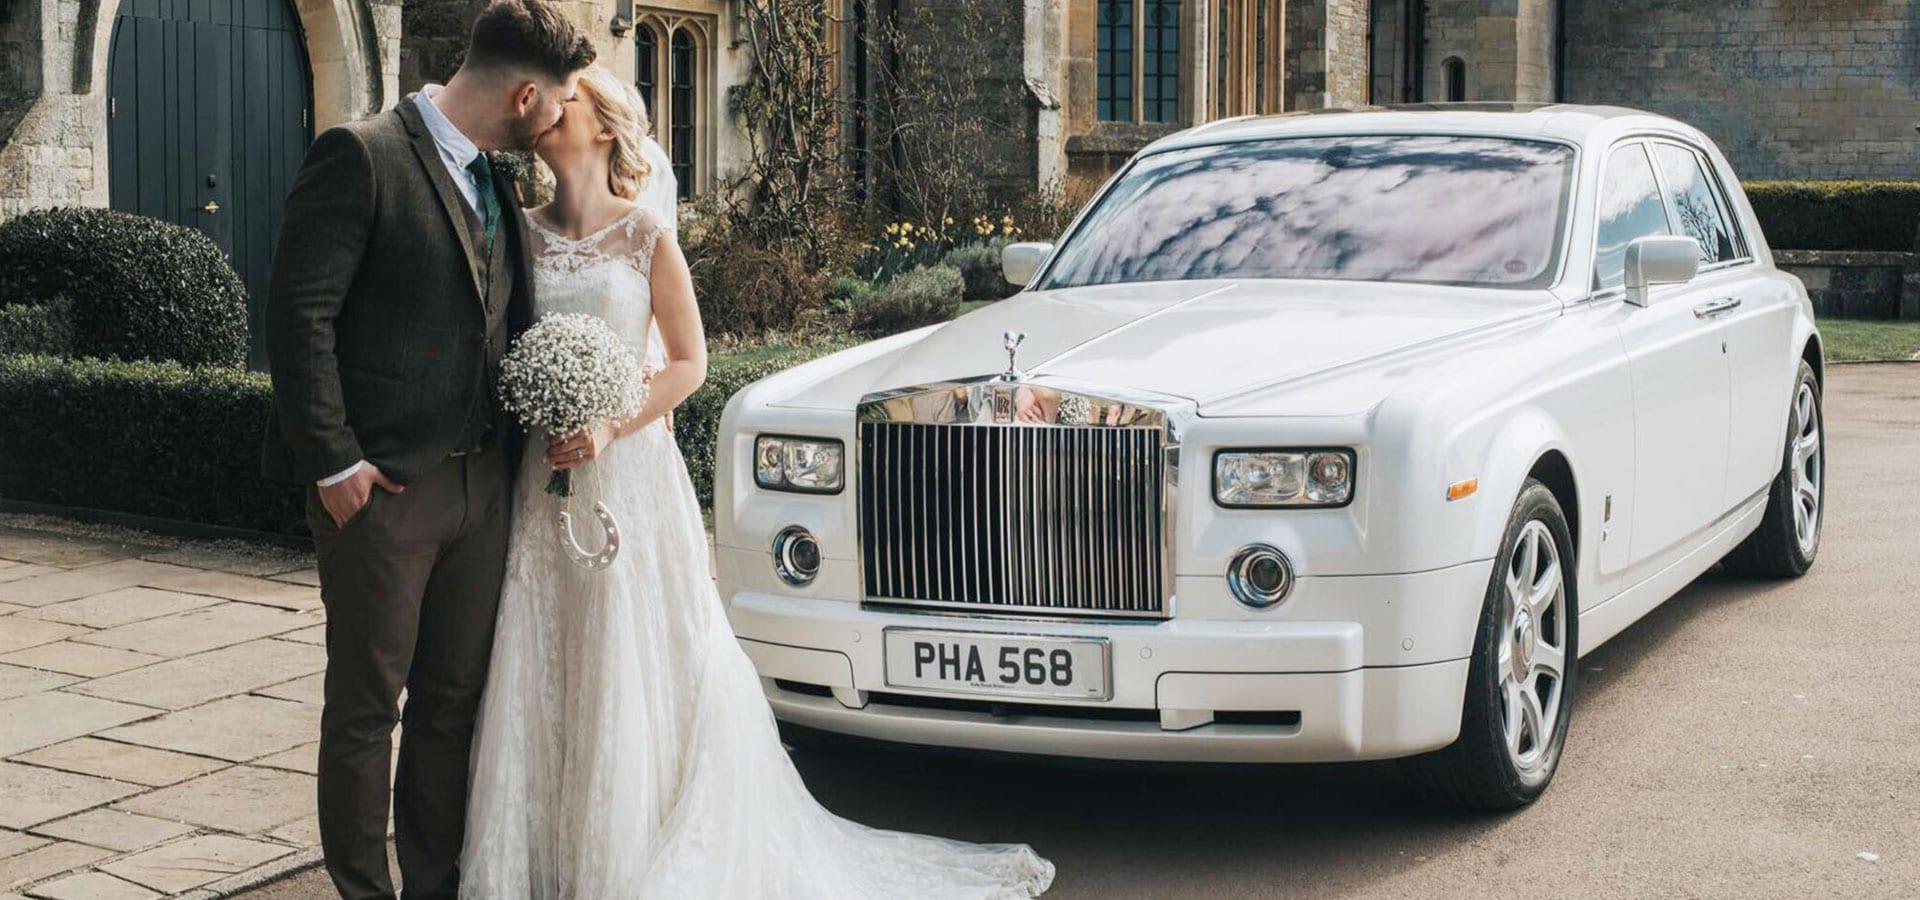 Homepage-Hero-7-Rolls-Royce-Phantom-Newlywed-couple